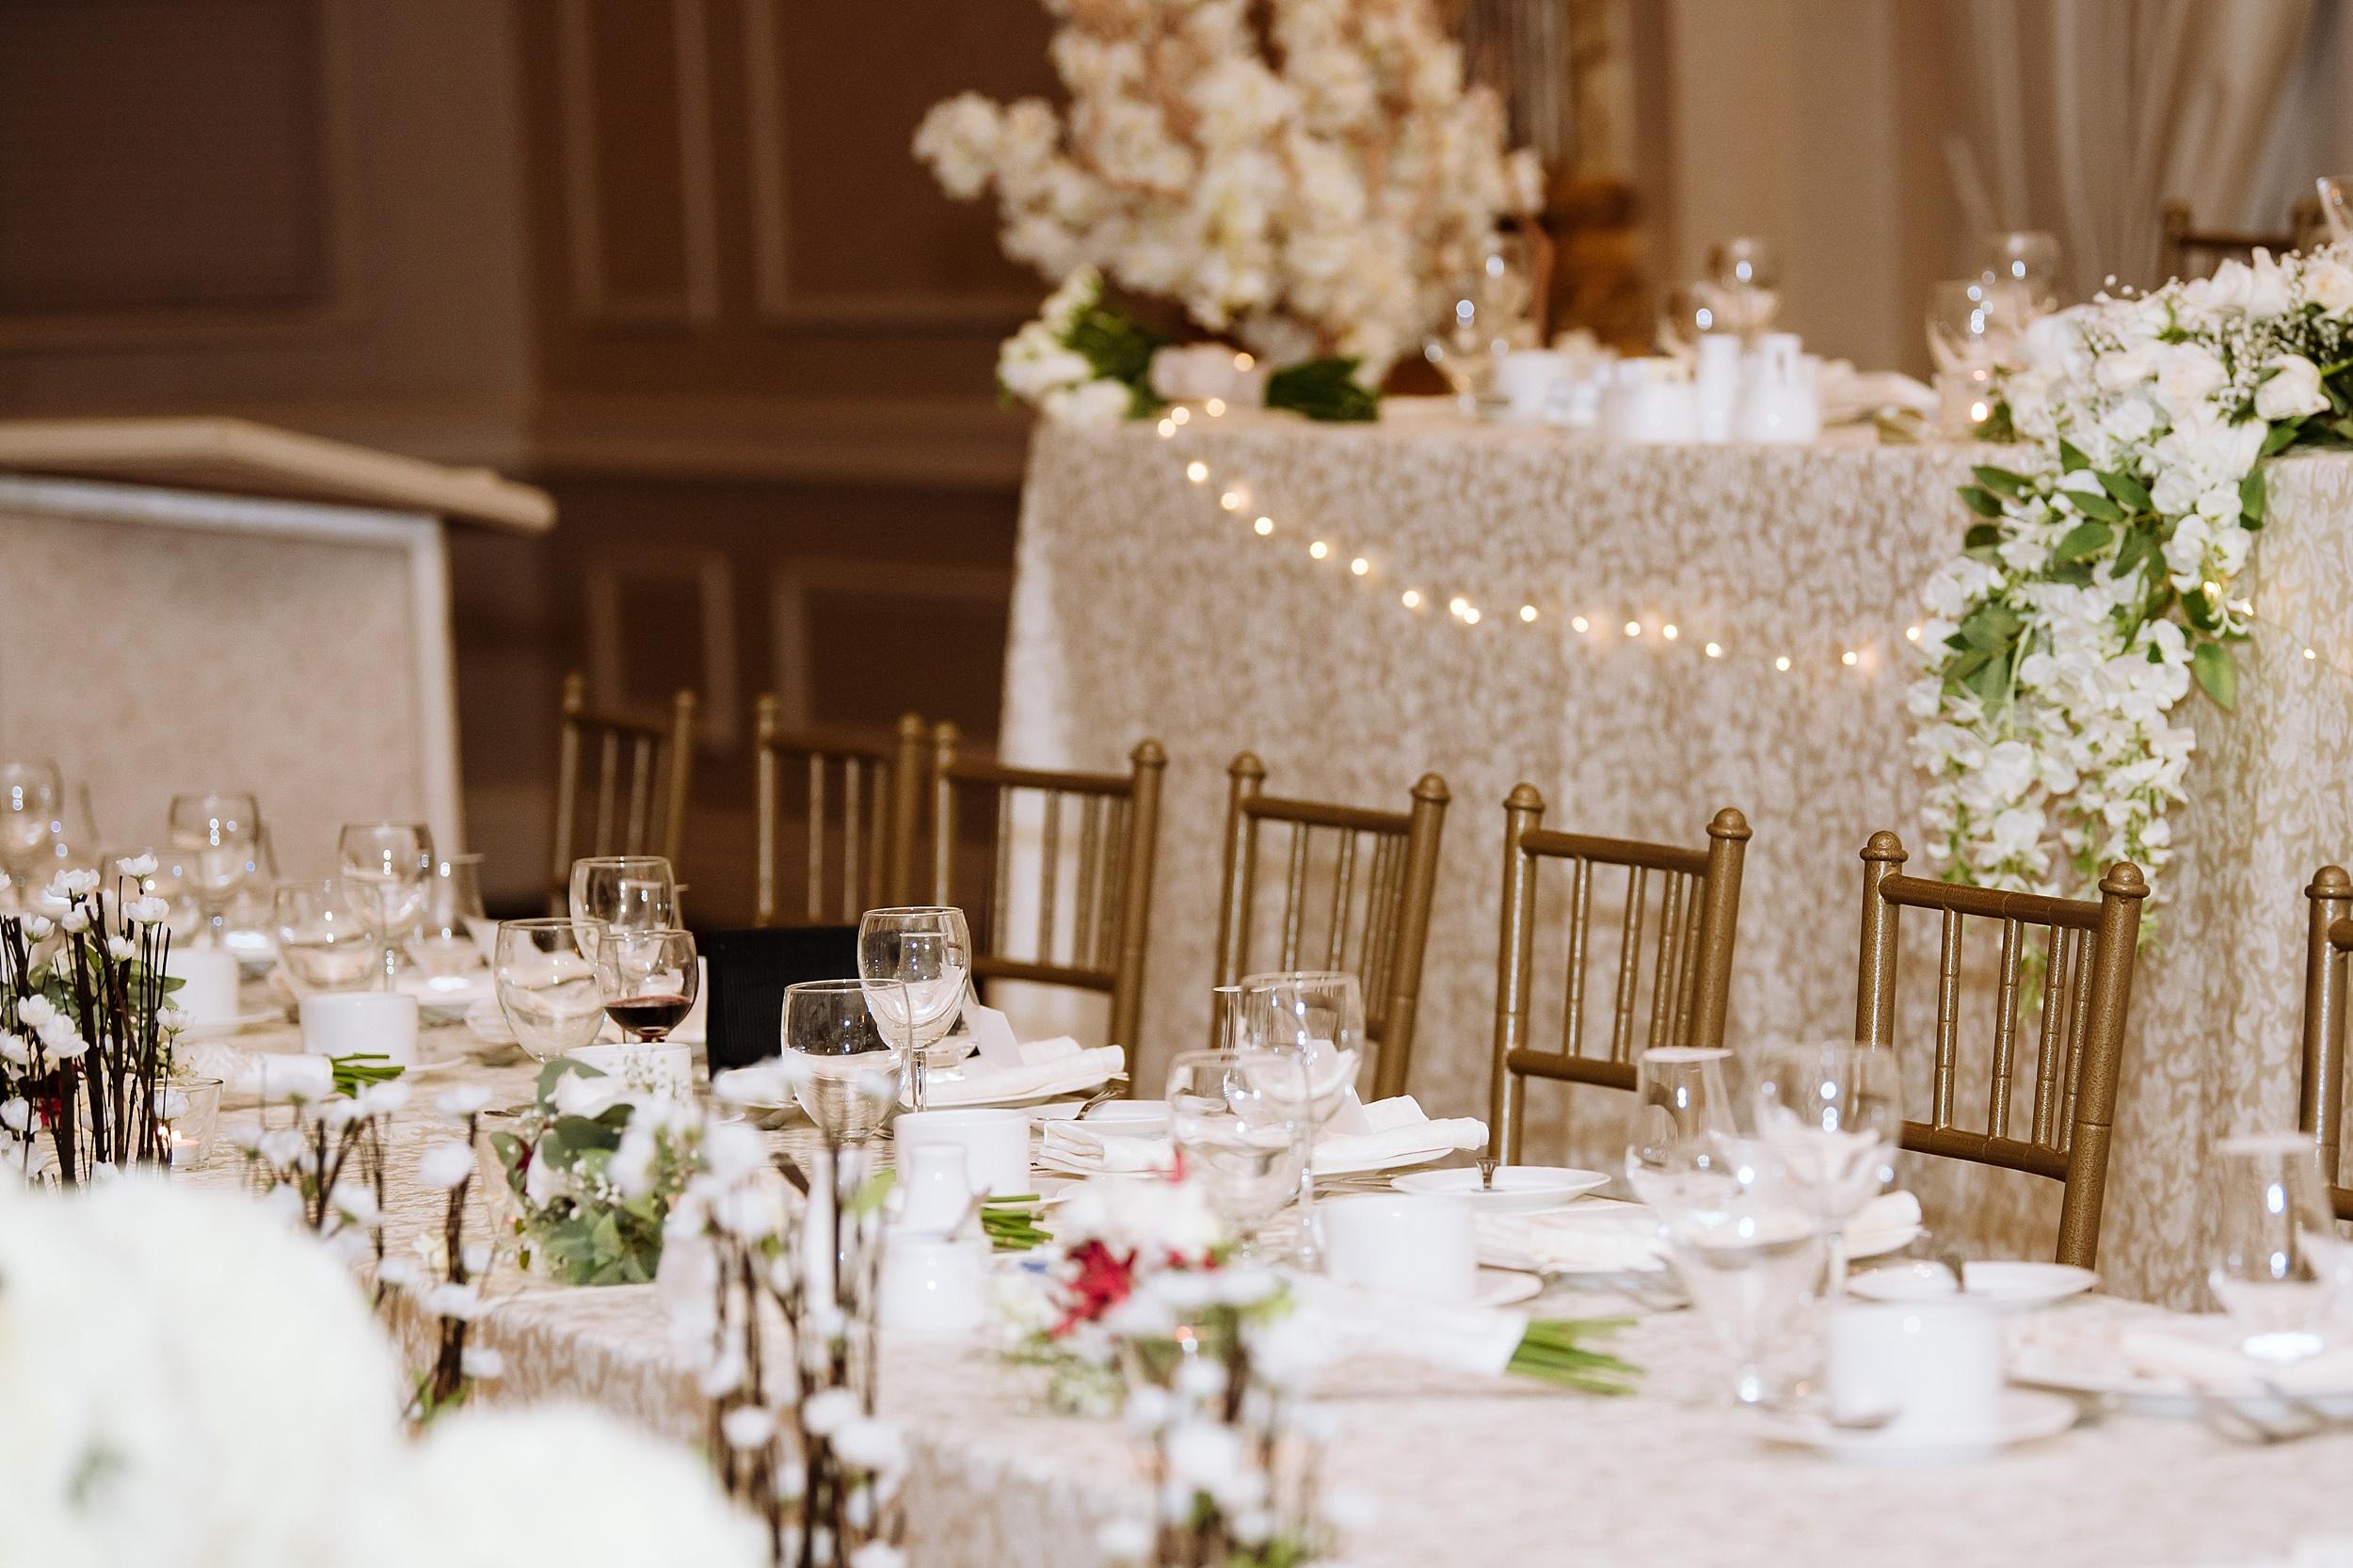 McMichael_Art_Collection_Wedding_chateau_le_jardin_Justine_Munro_Toronto_Photographer063.jpg